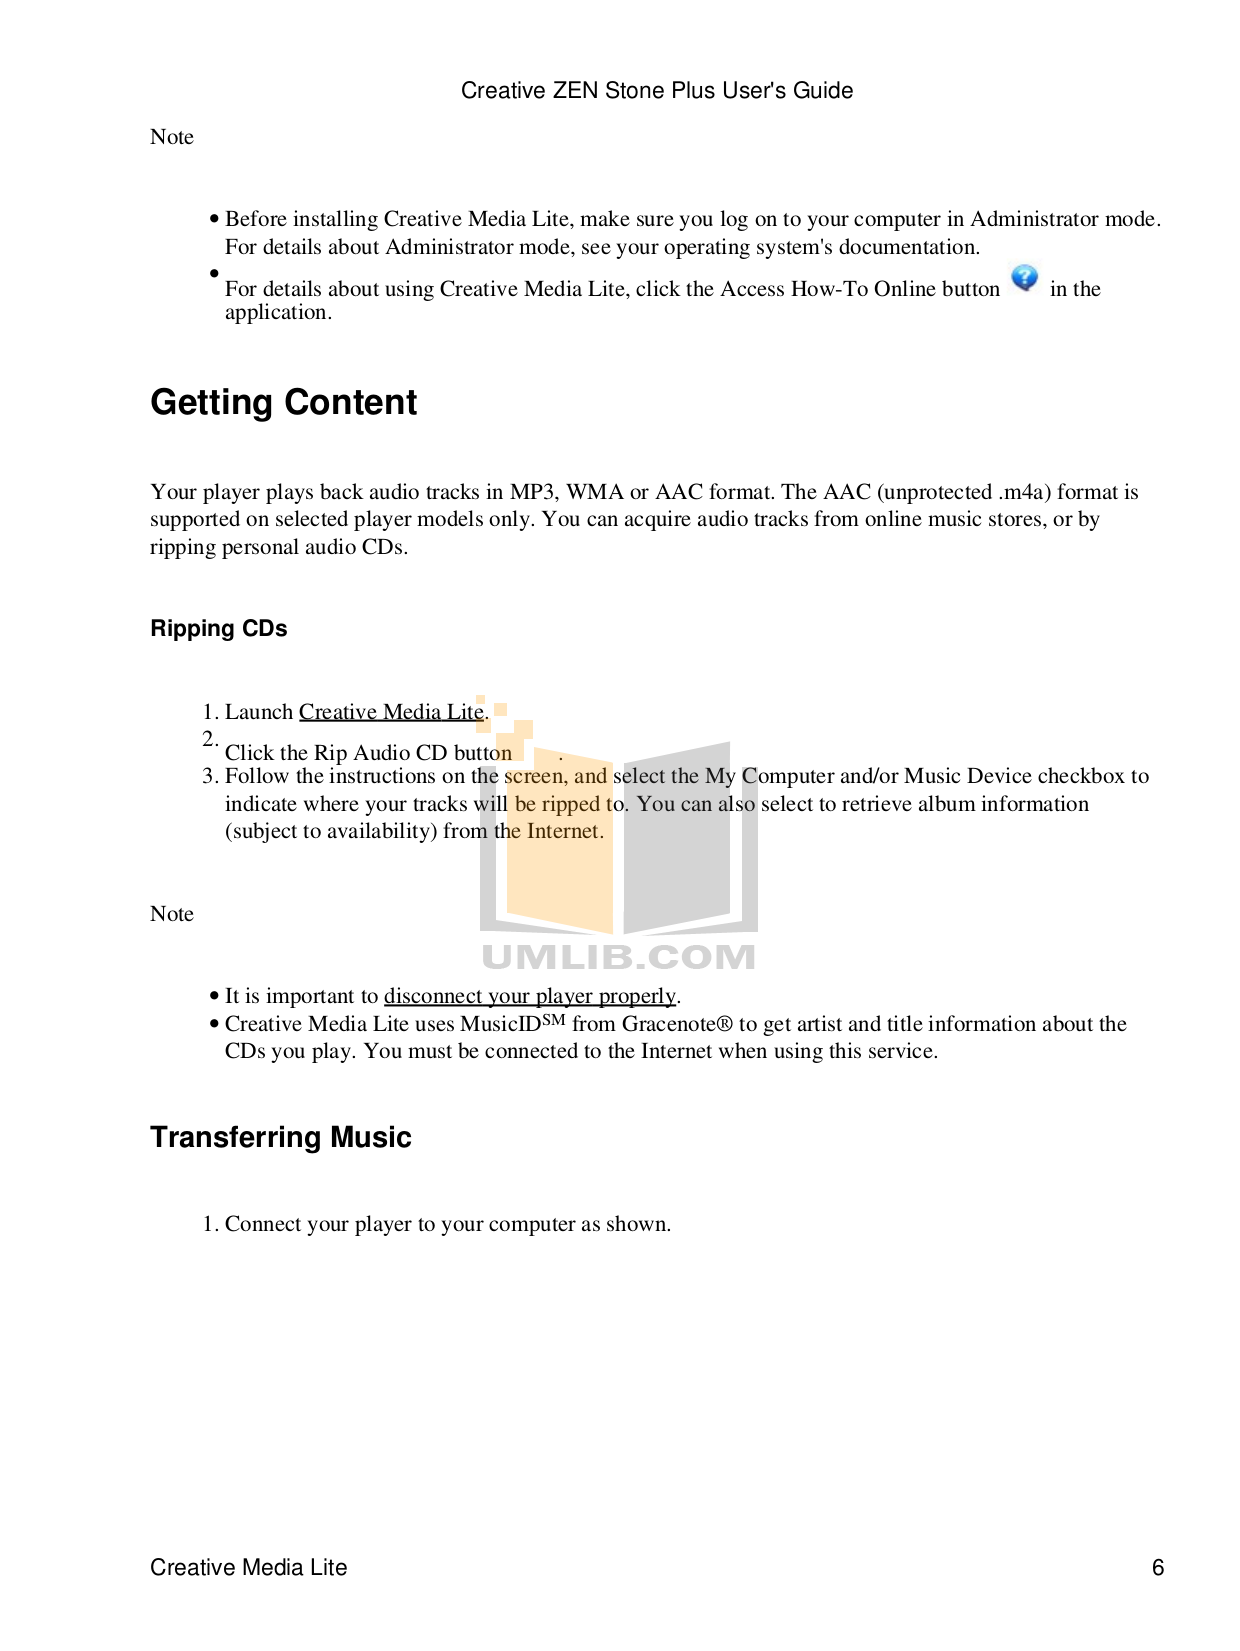 pdf manual for creative mp3 player zen zen stone plus 2gb rh umlib com Creative Zen Creative Zen 4GB